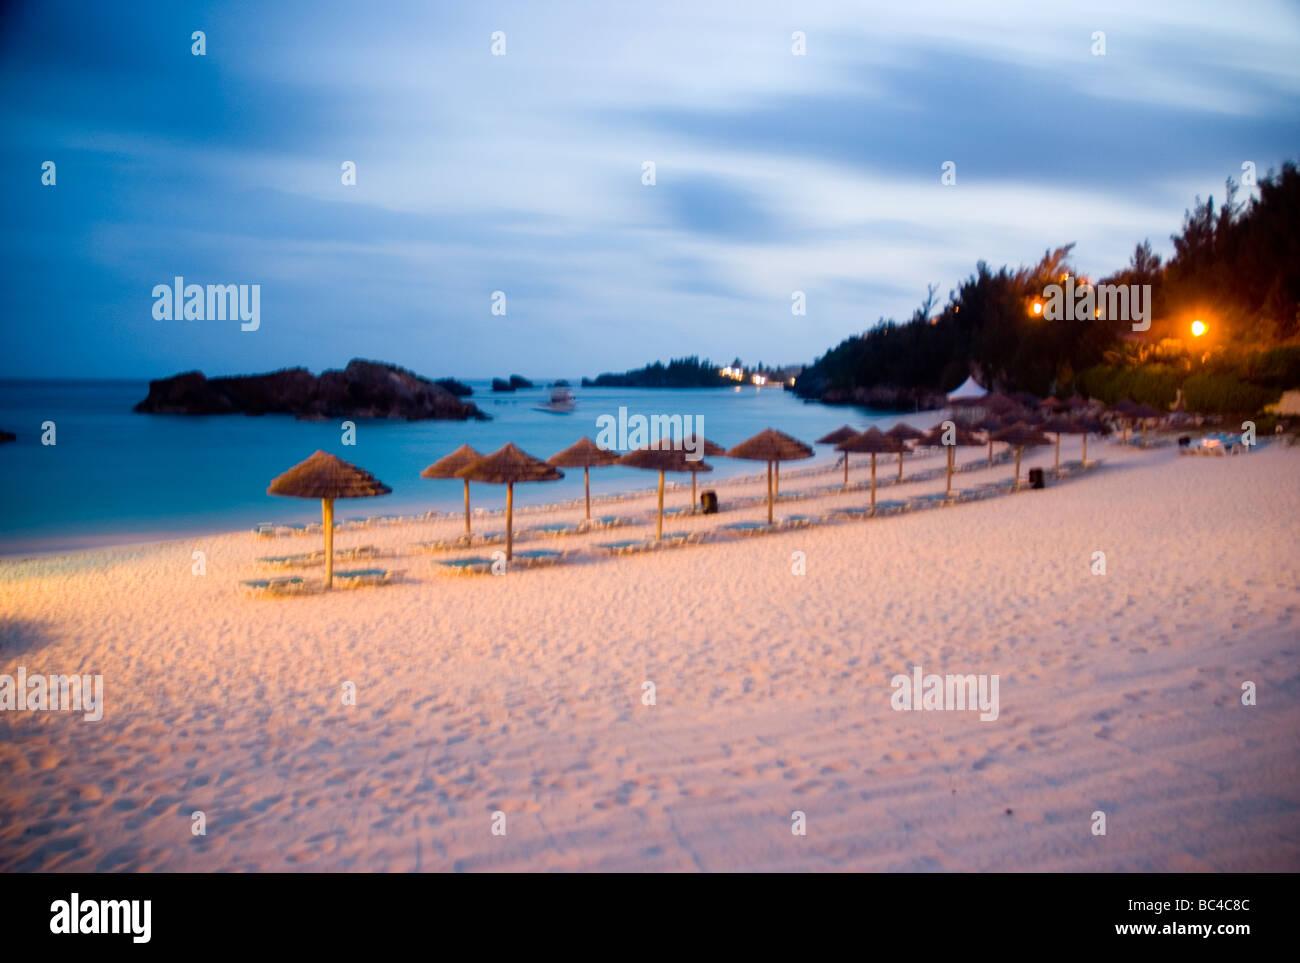 The beach of the Fairmont Southampton Hotel Southampton Bermuda Southampton. - Stock Image